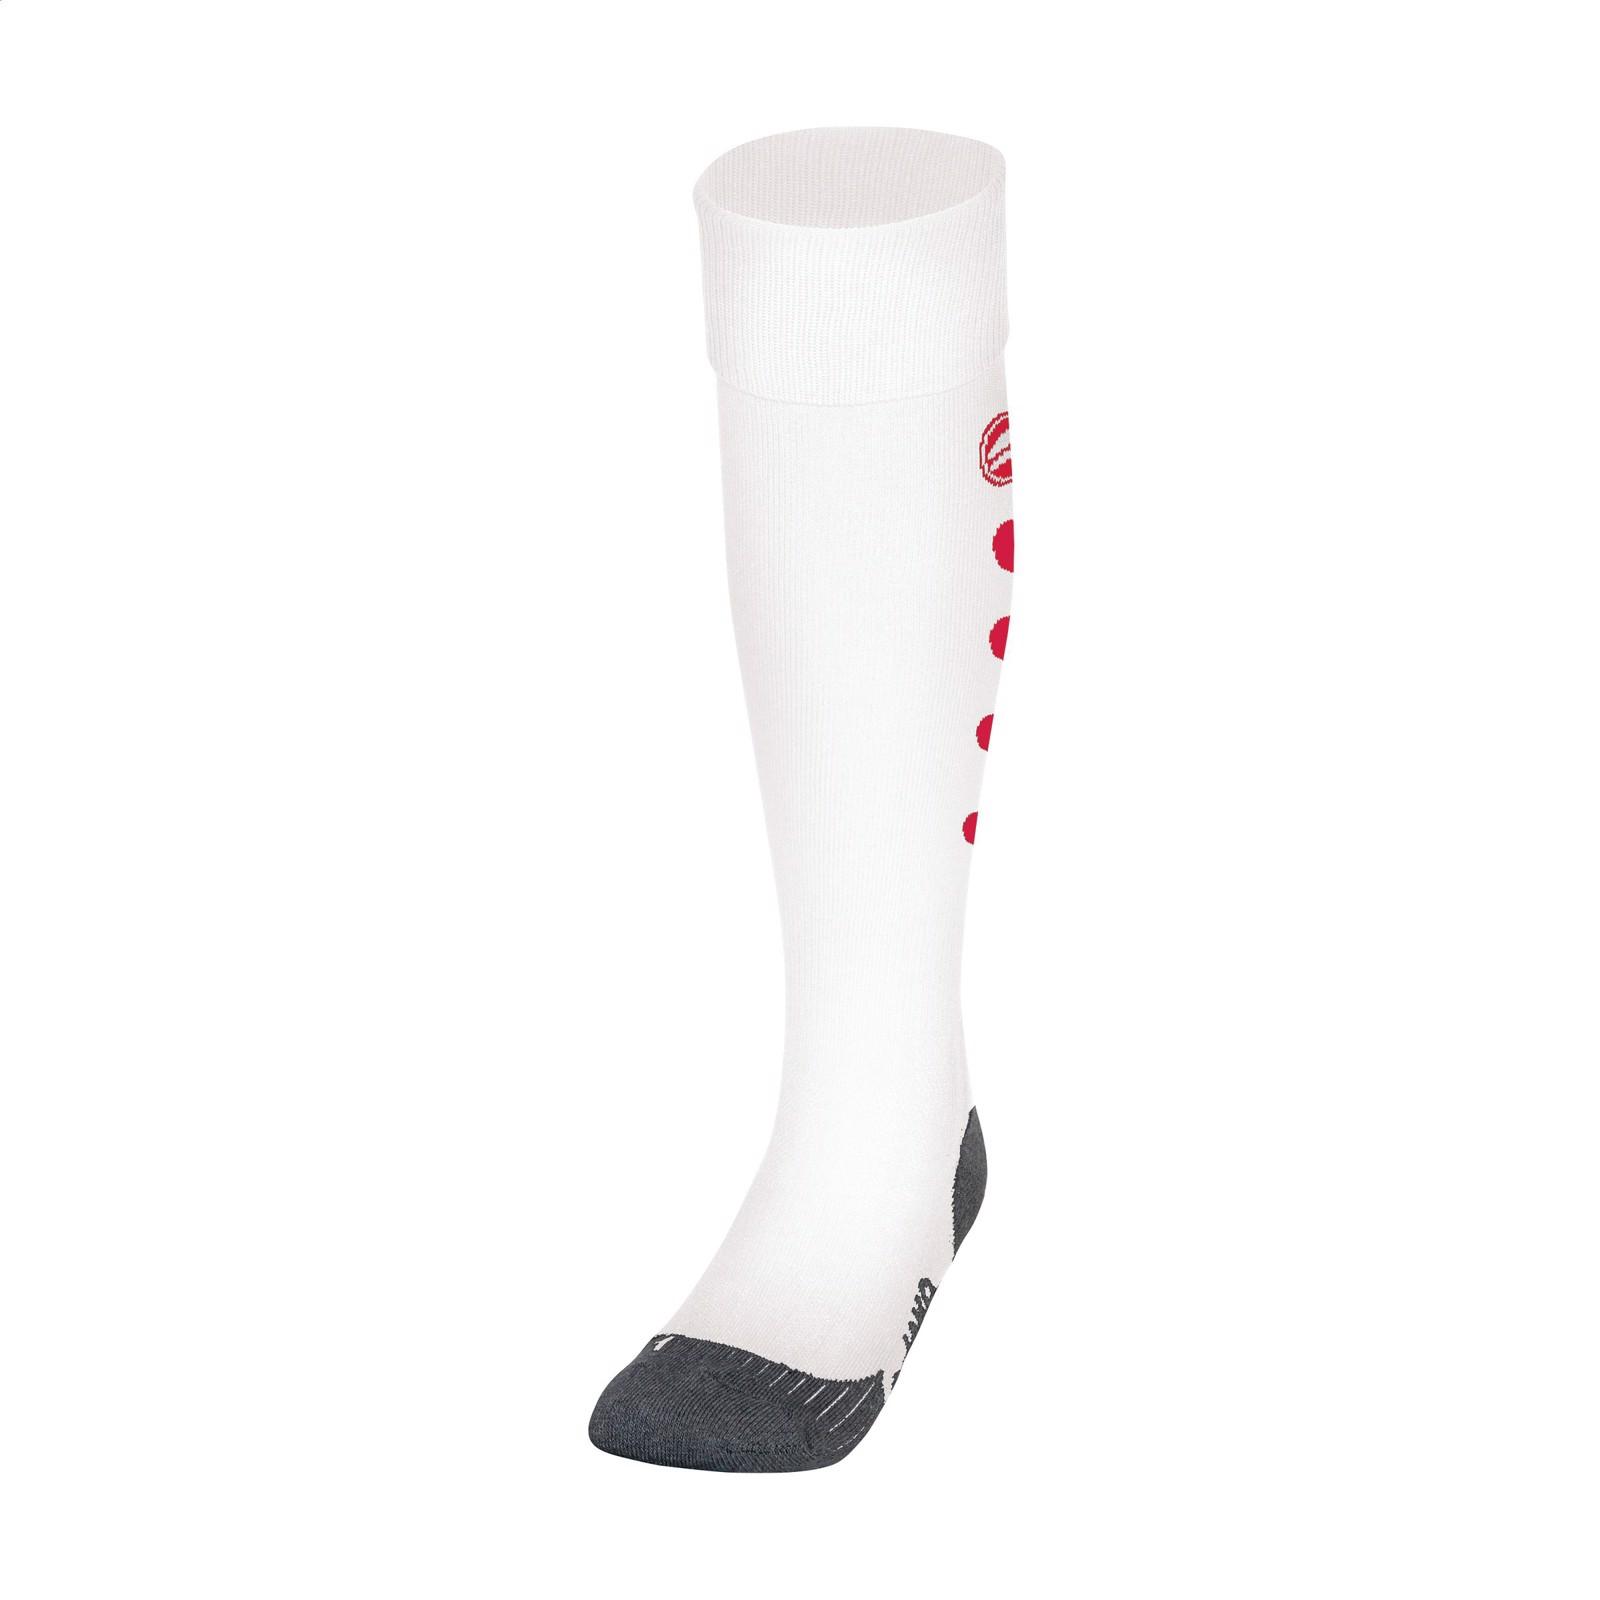 Jako® Roma Sport Socks - White / Red / XS